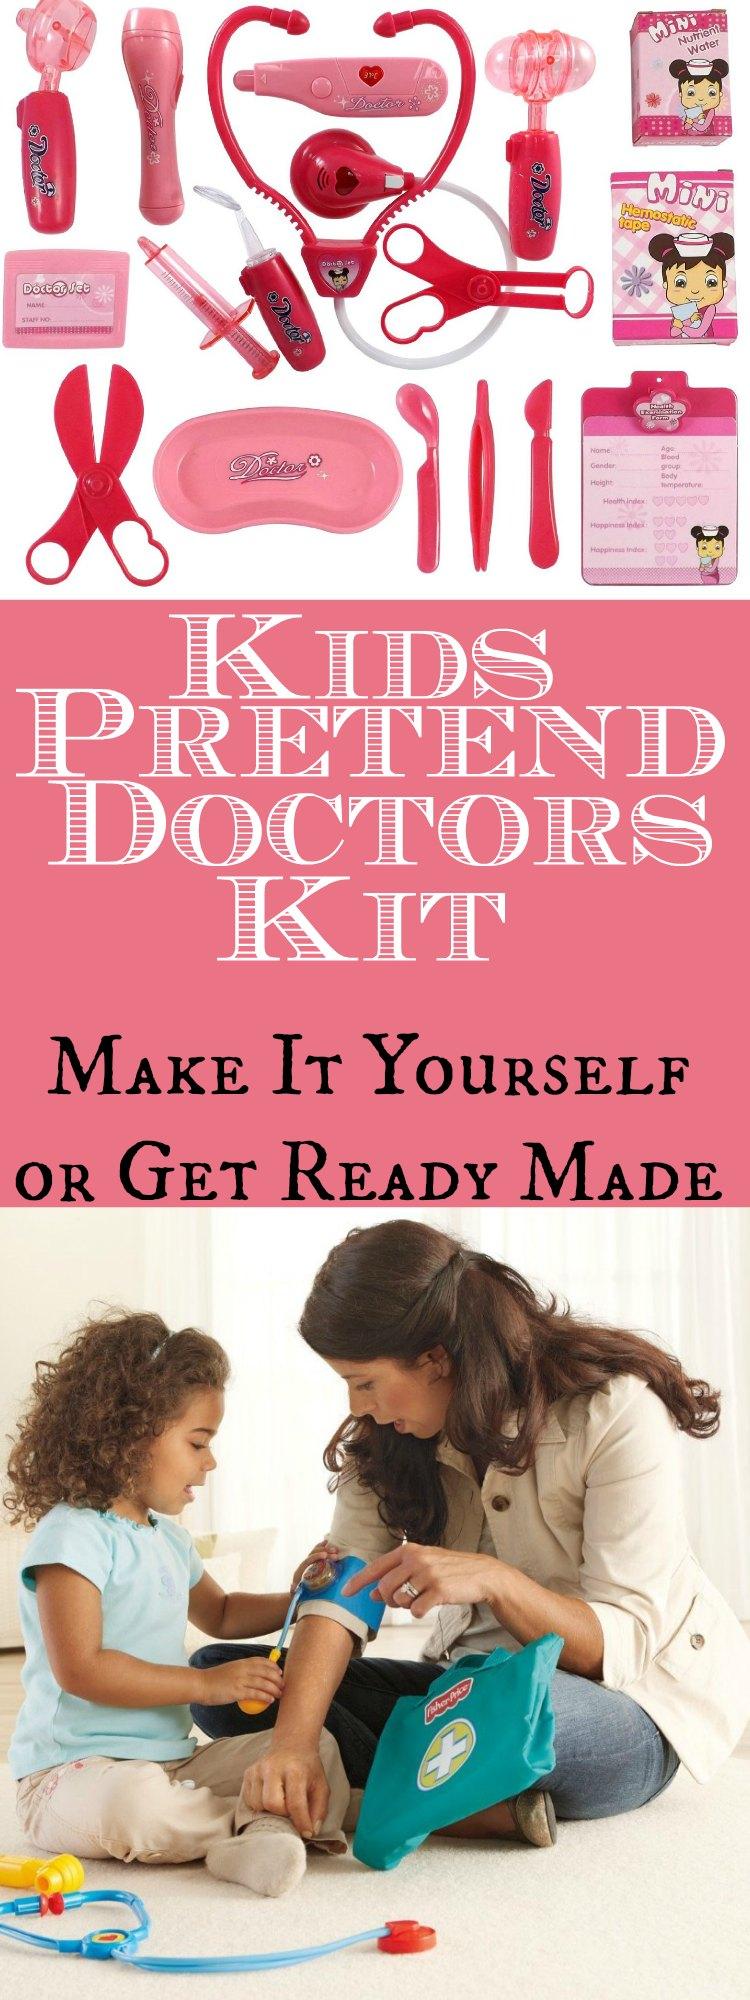 Pretend Doctors Kit